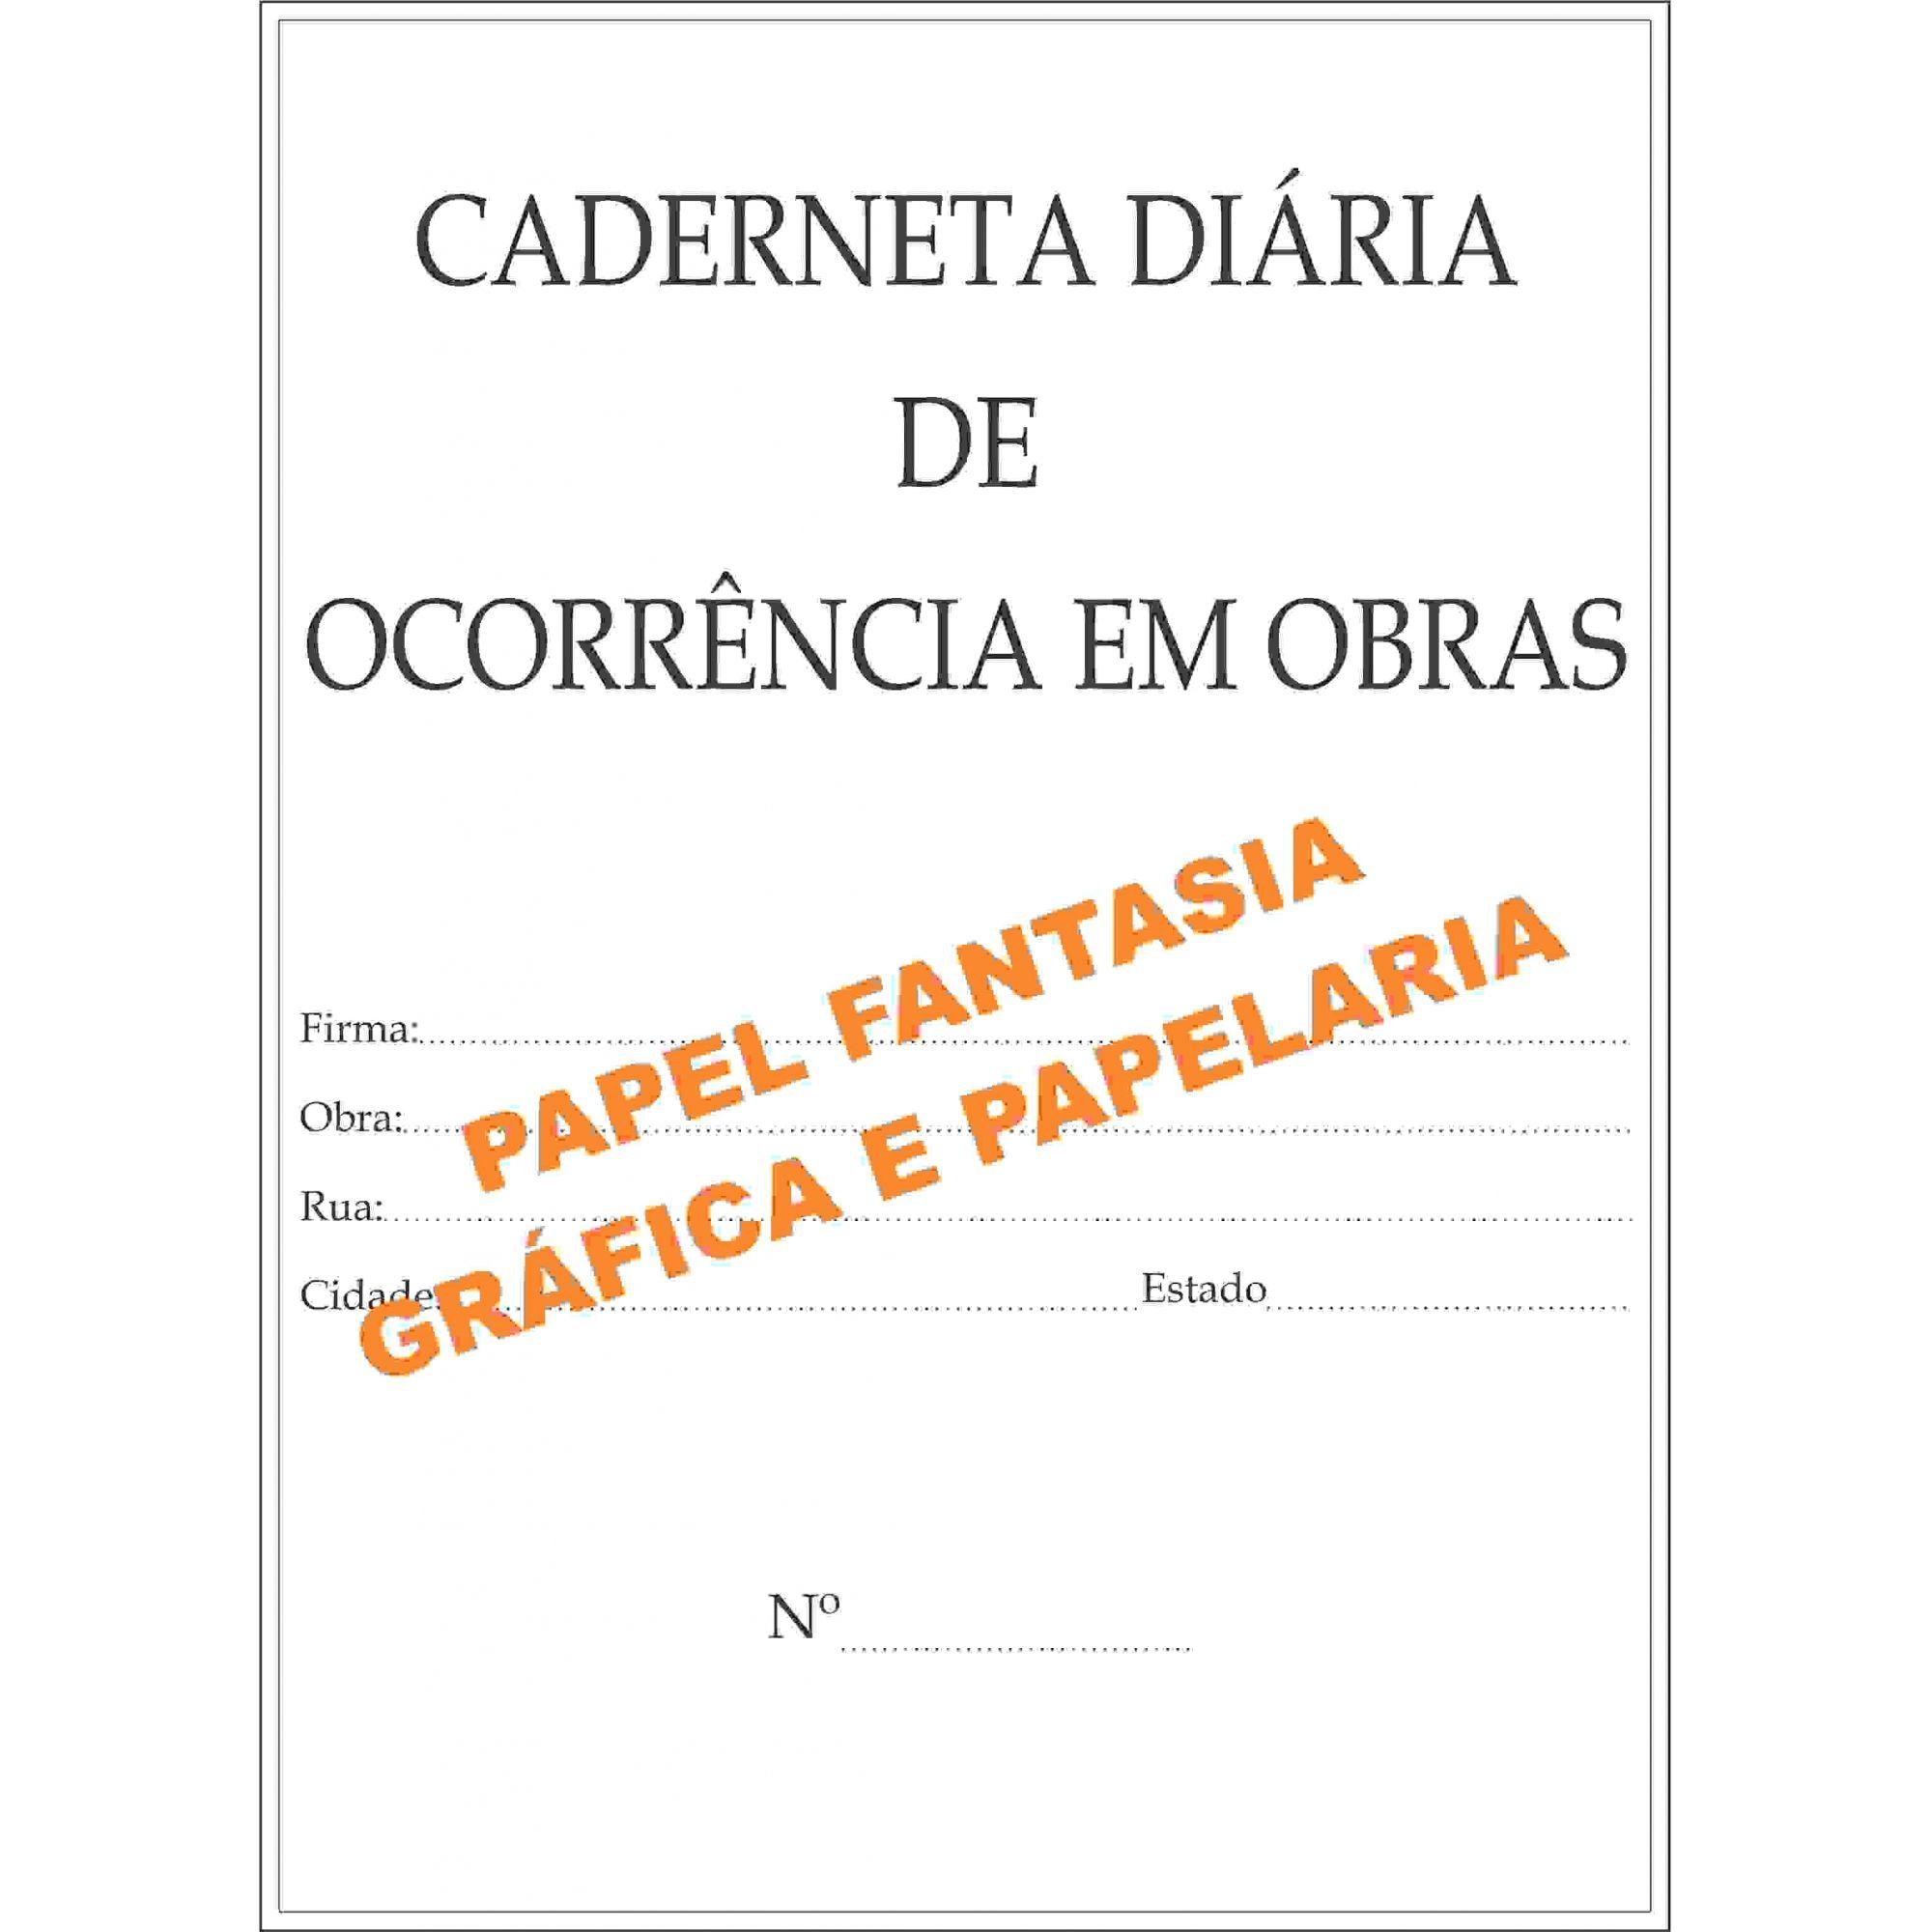 Livro Caderneta Diario de Obra 50 x 4 (Papelfantasia)